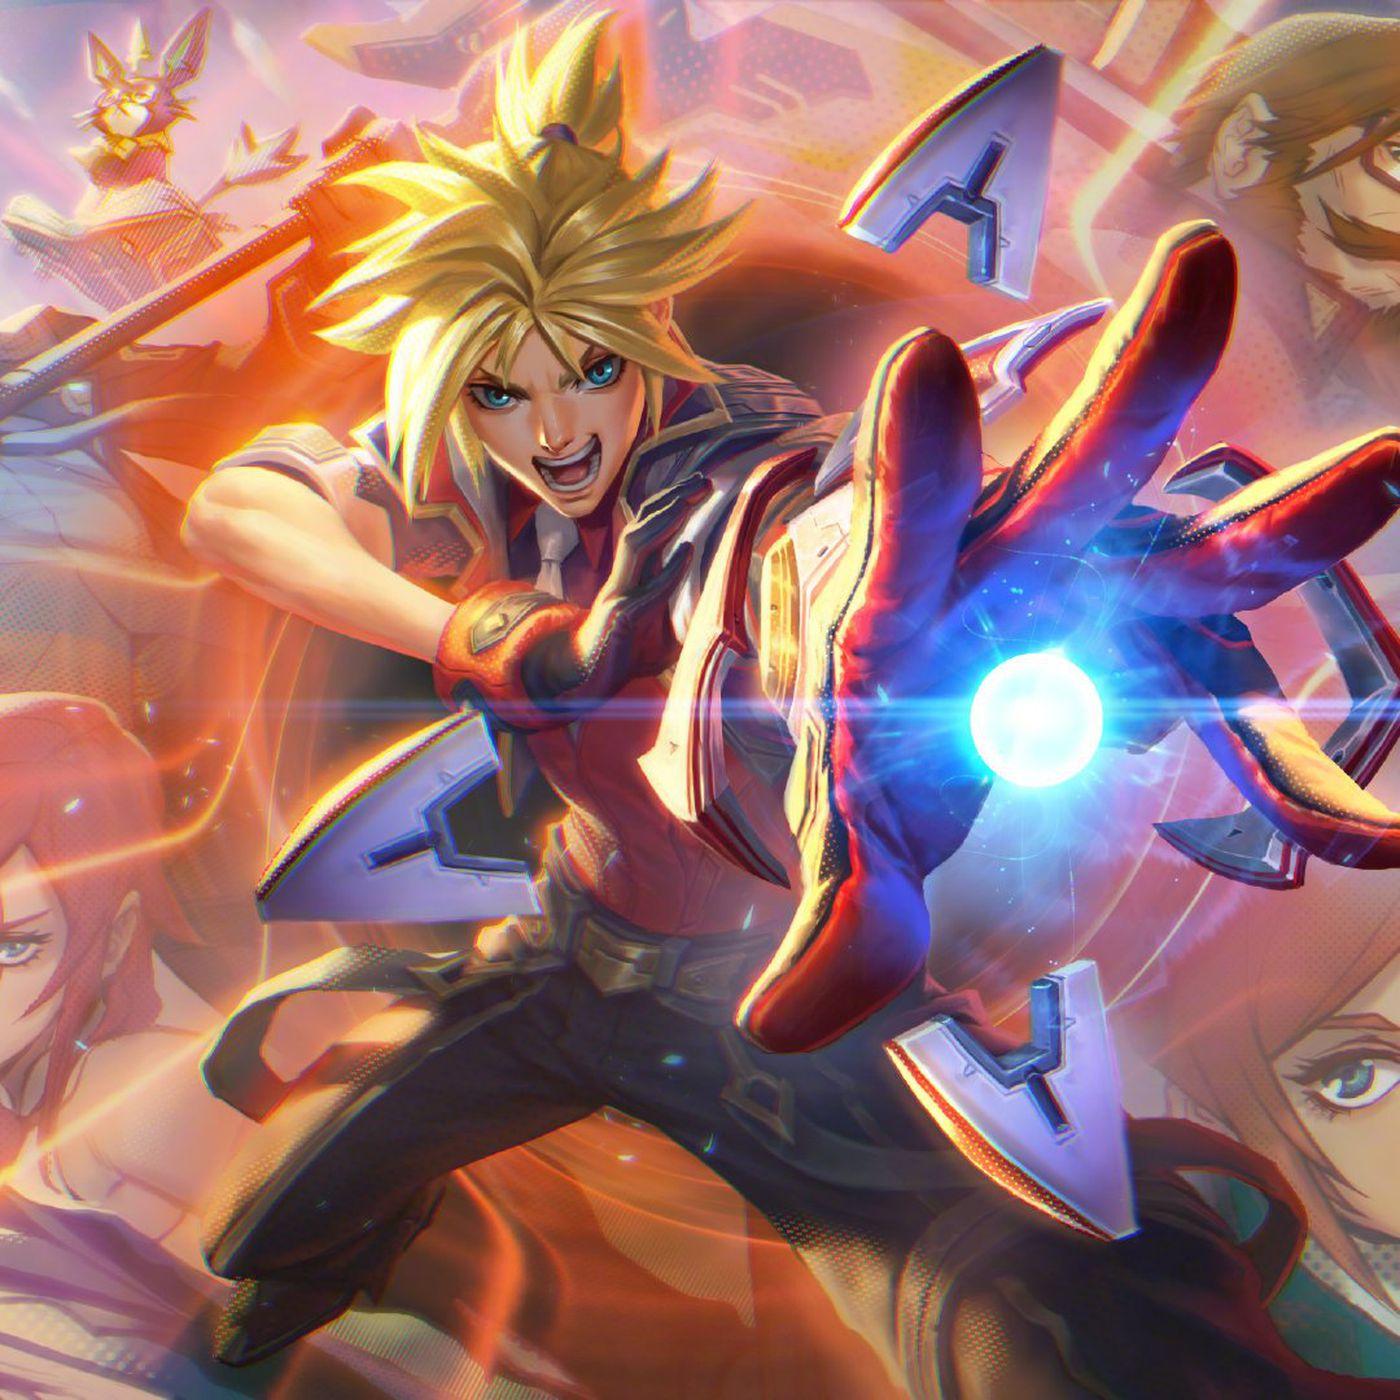 League Battle Academia Skins Ezreal Katarina Yuumi Lux And More